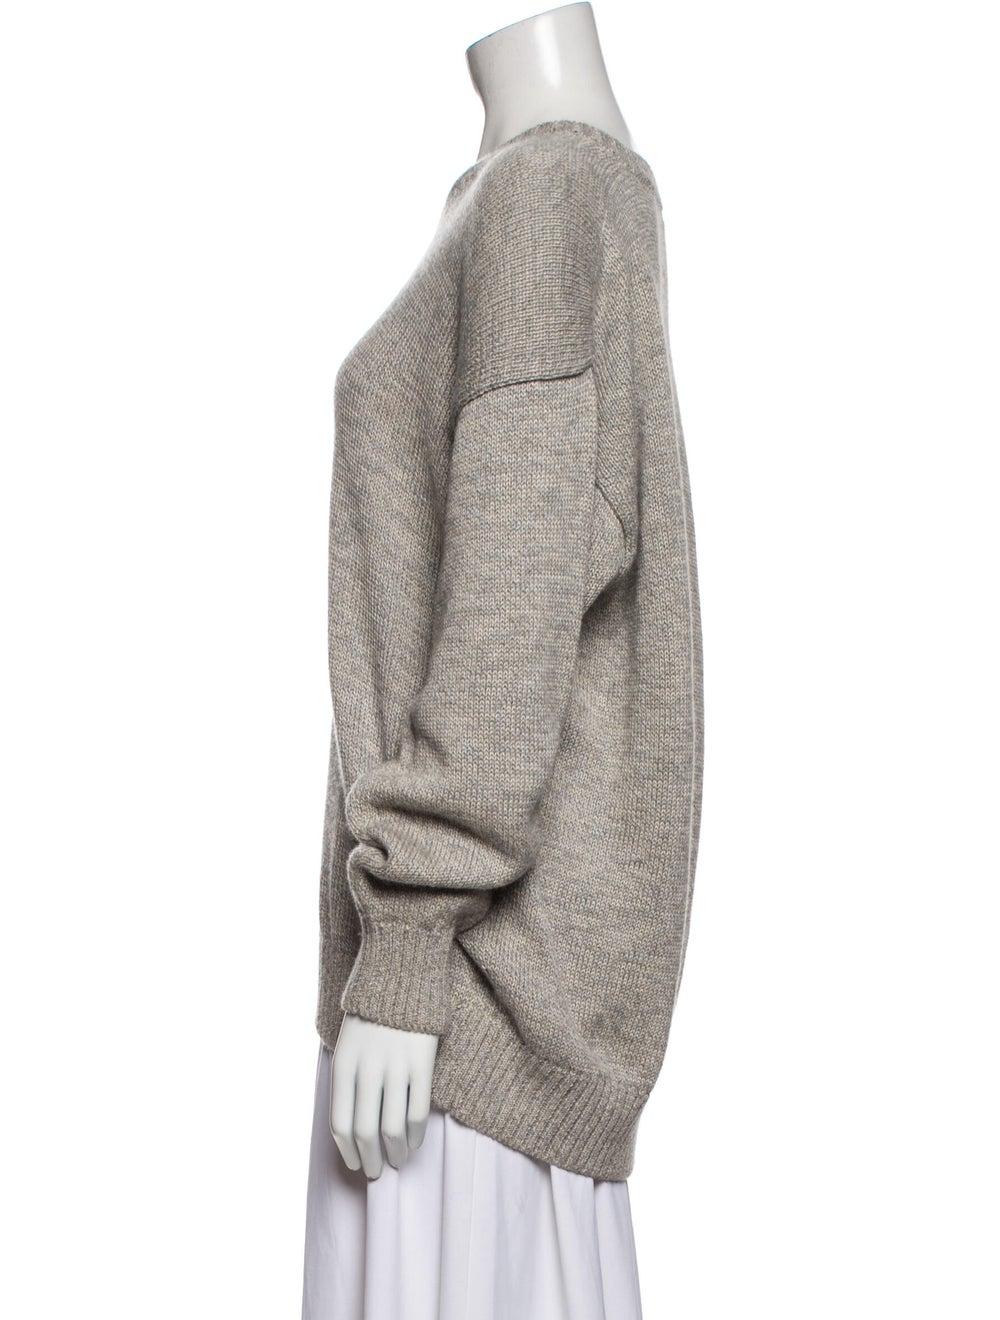 Inis Meáin V-Neck Sweater Grey - image 2